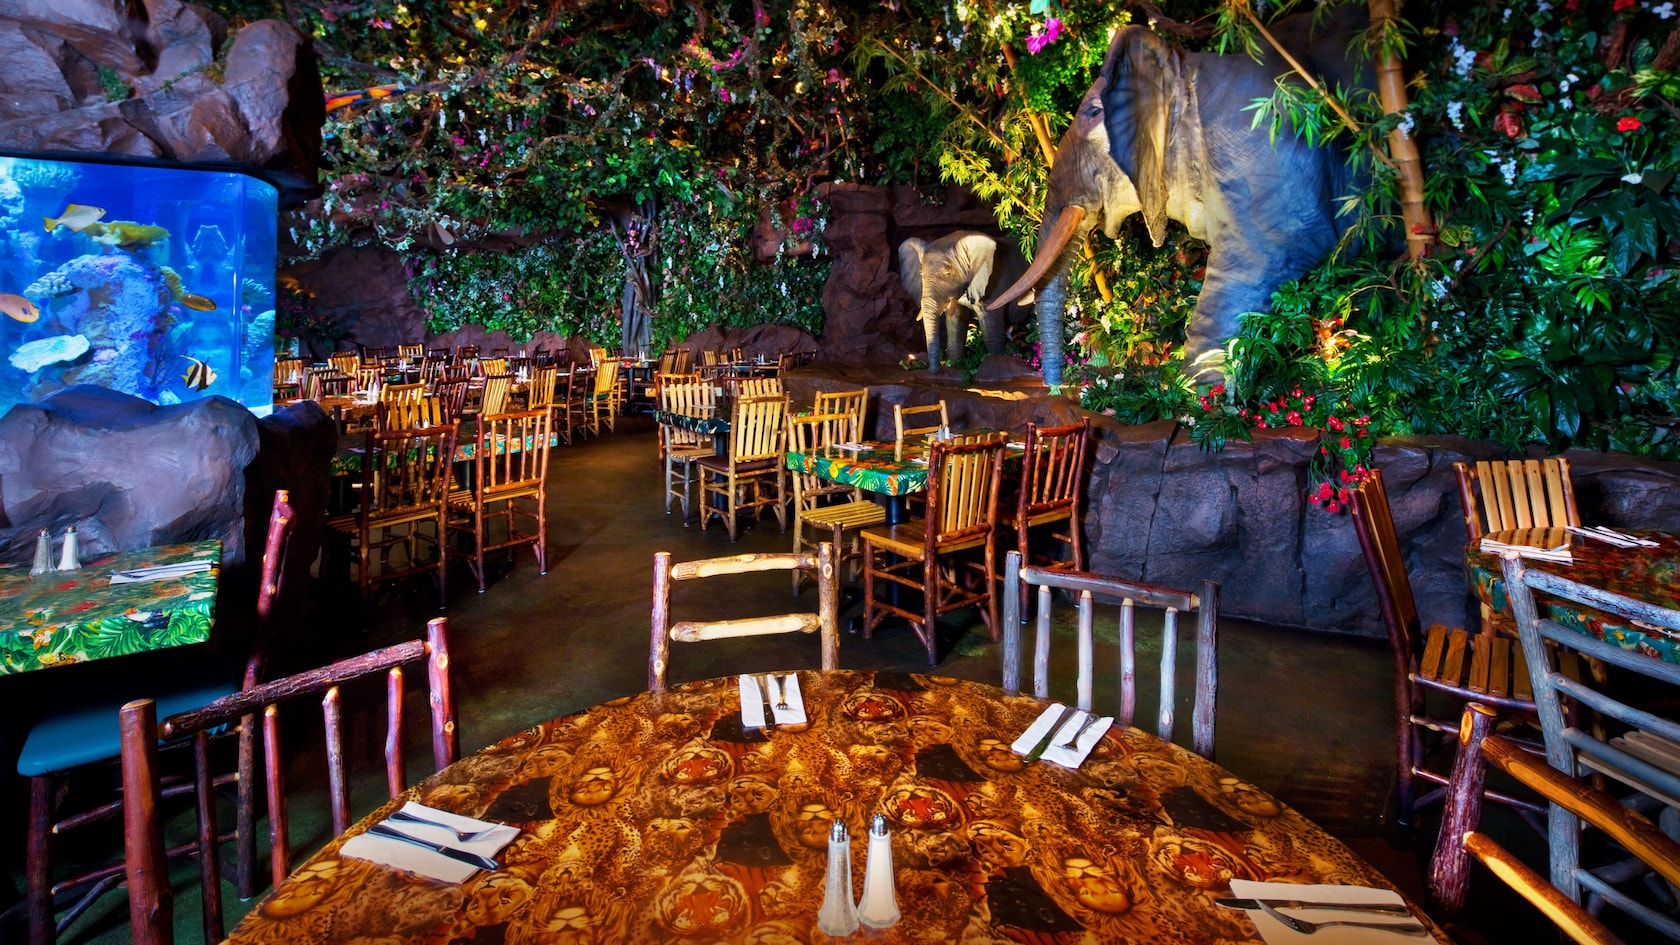 An interior shot of the Rainforest Cafe.